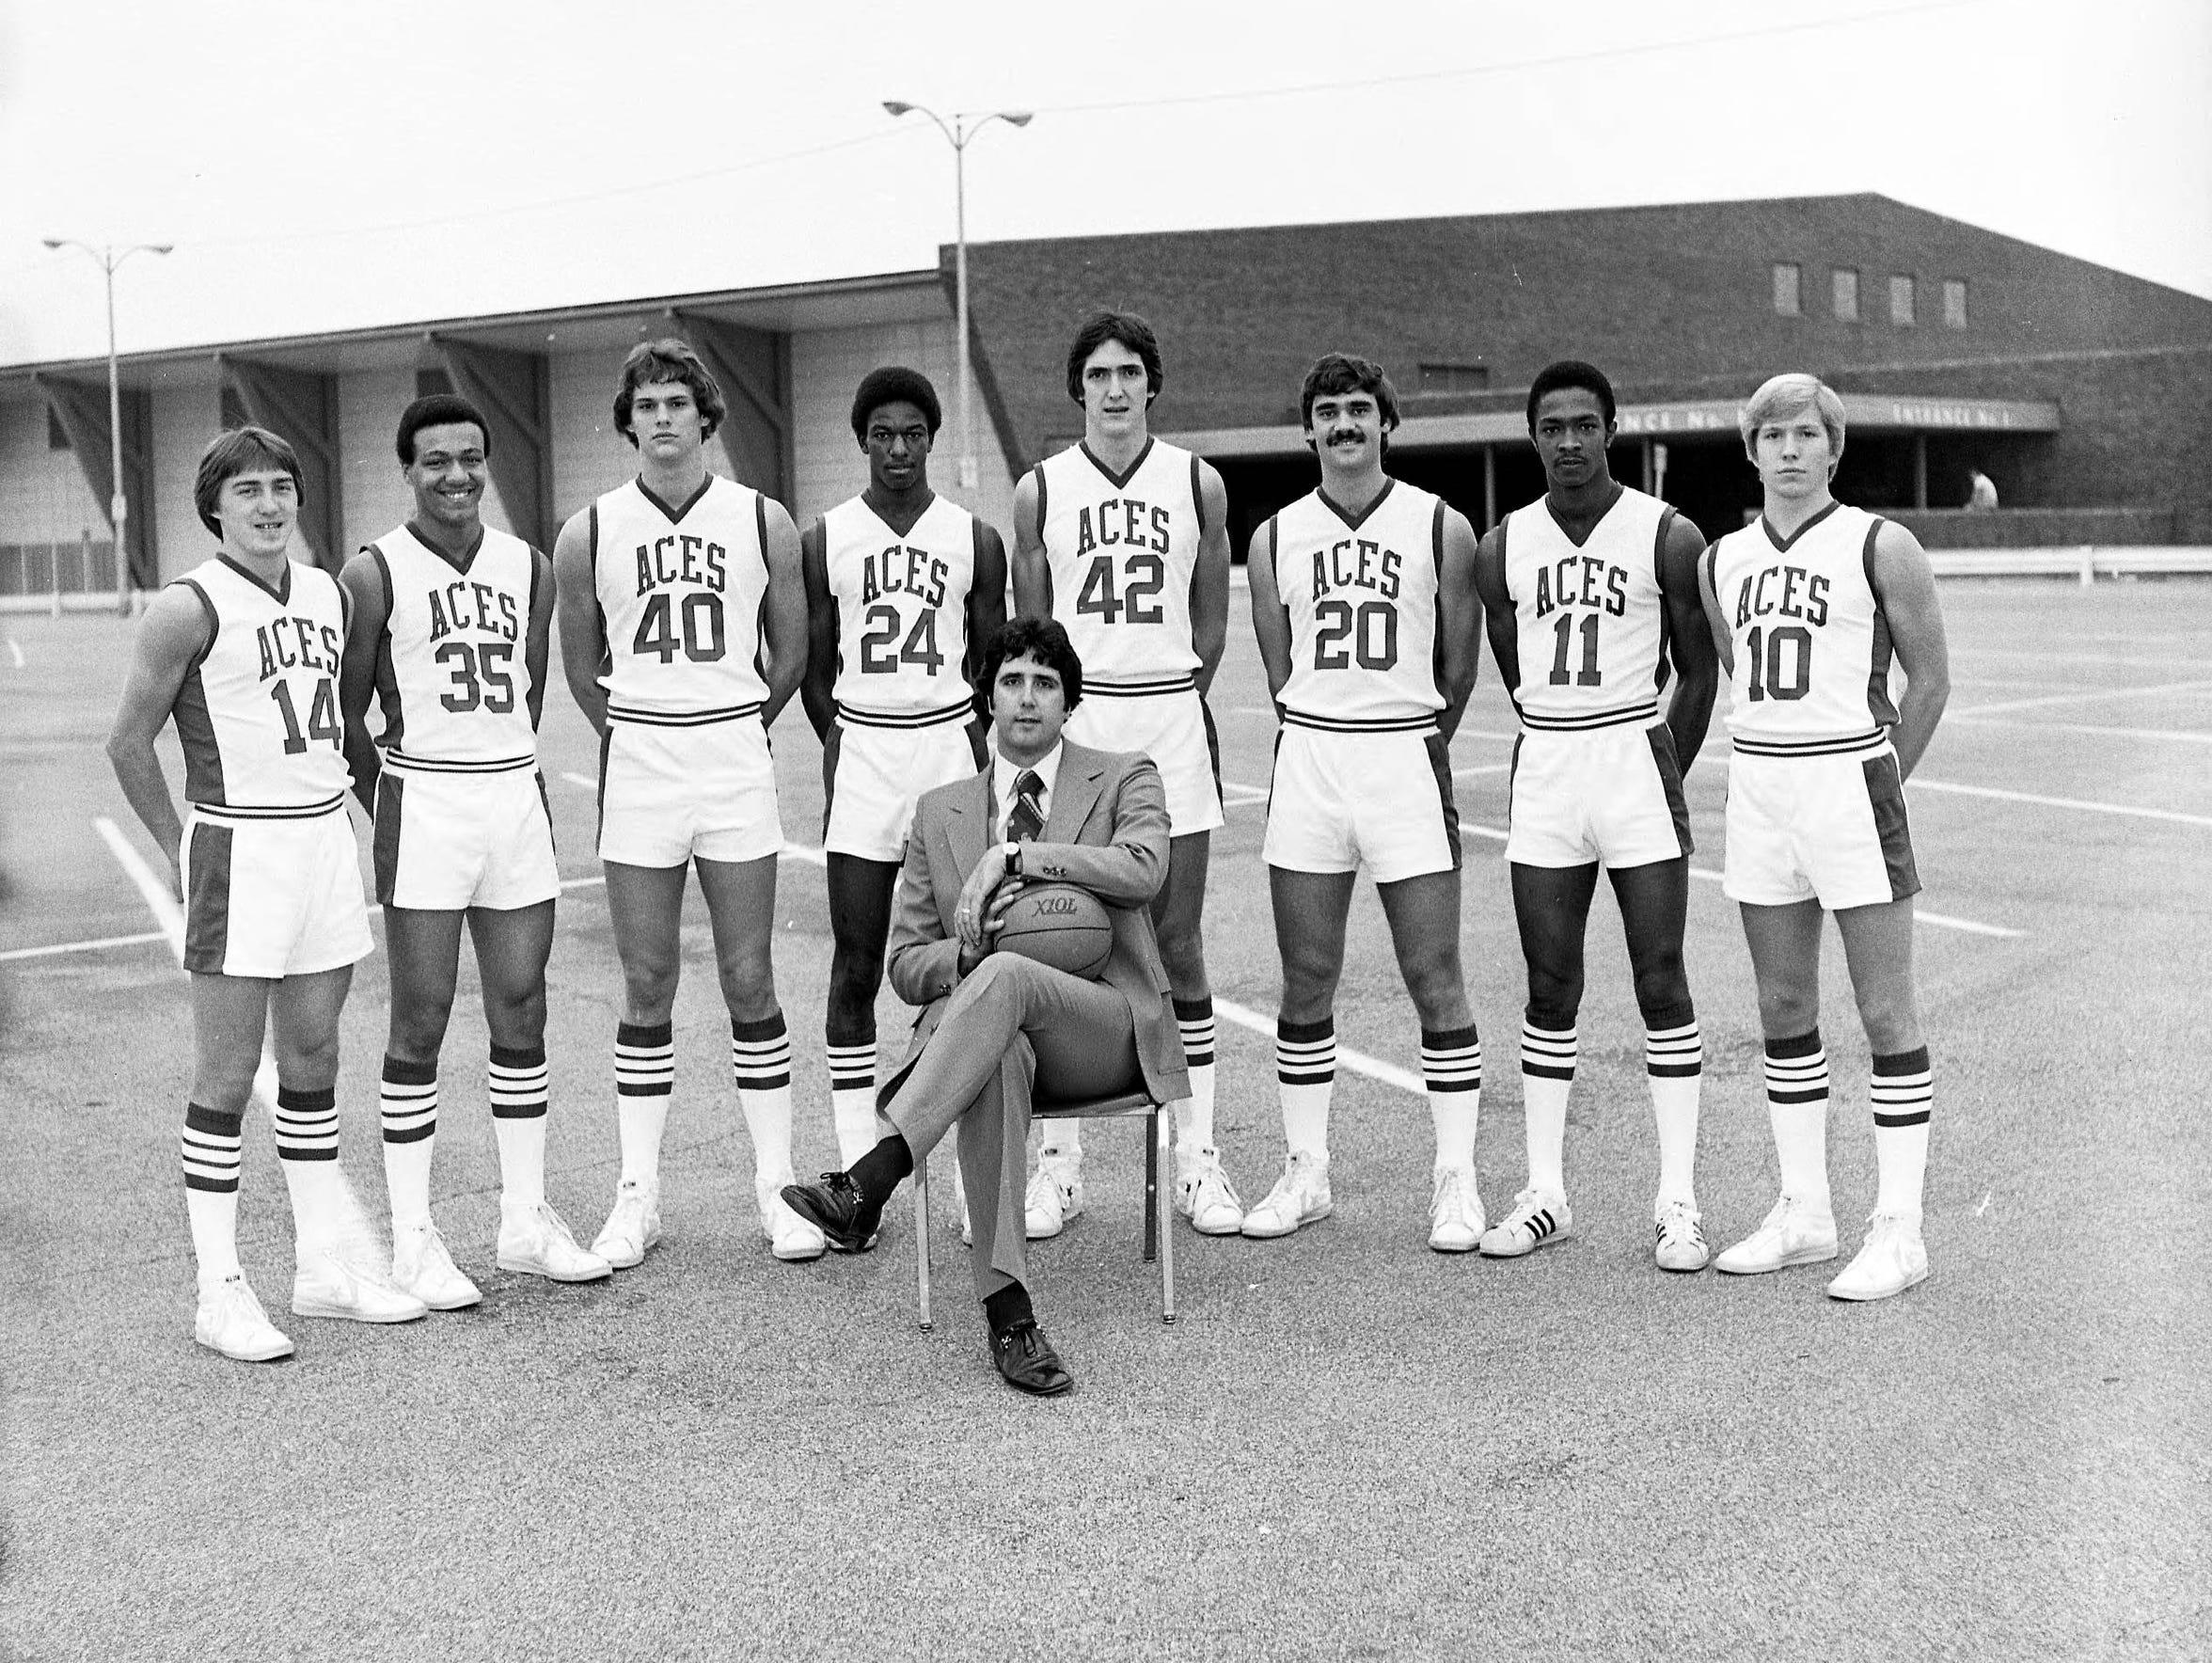 University of Evansville Purple Ace's 1977 basketball